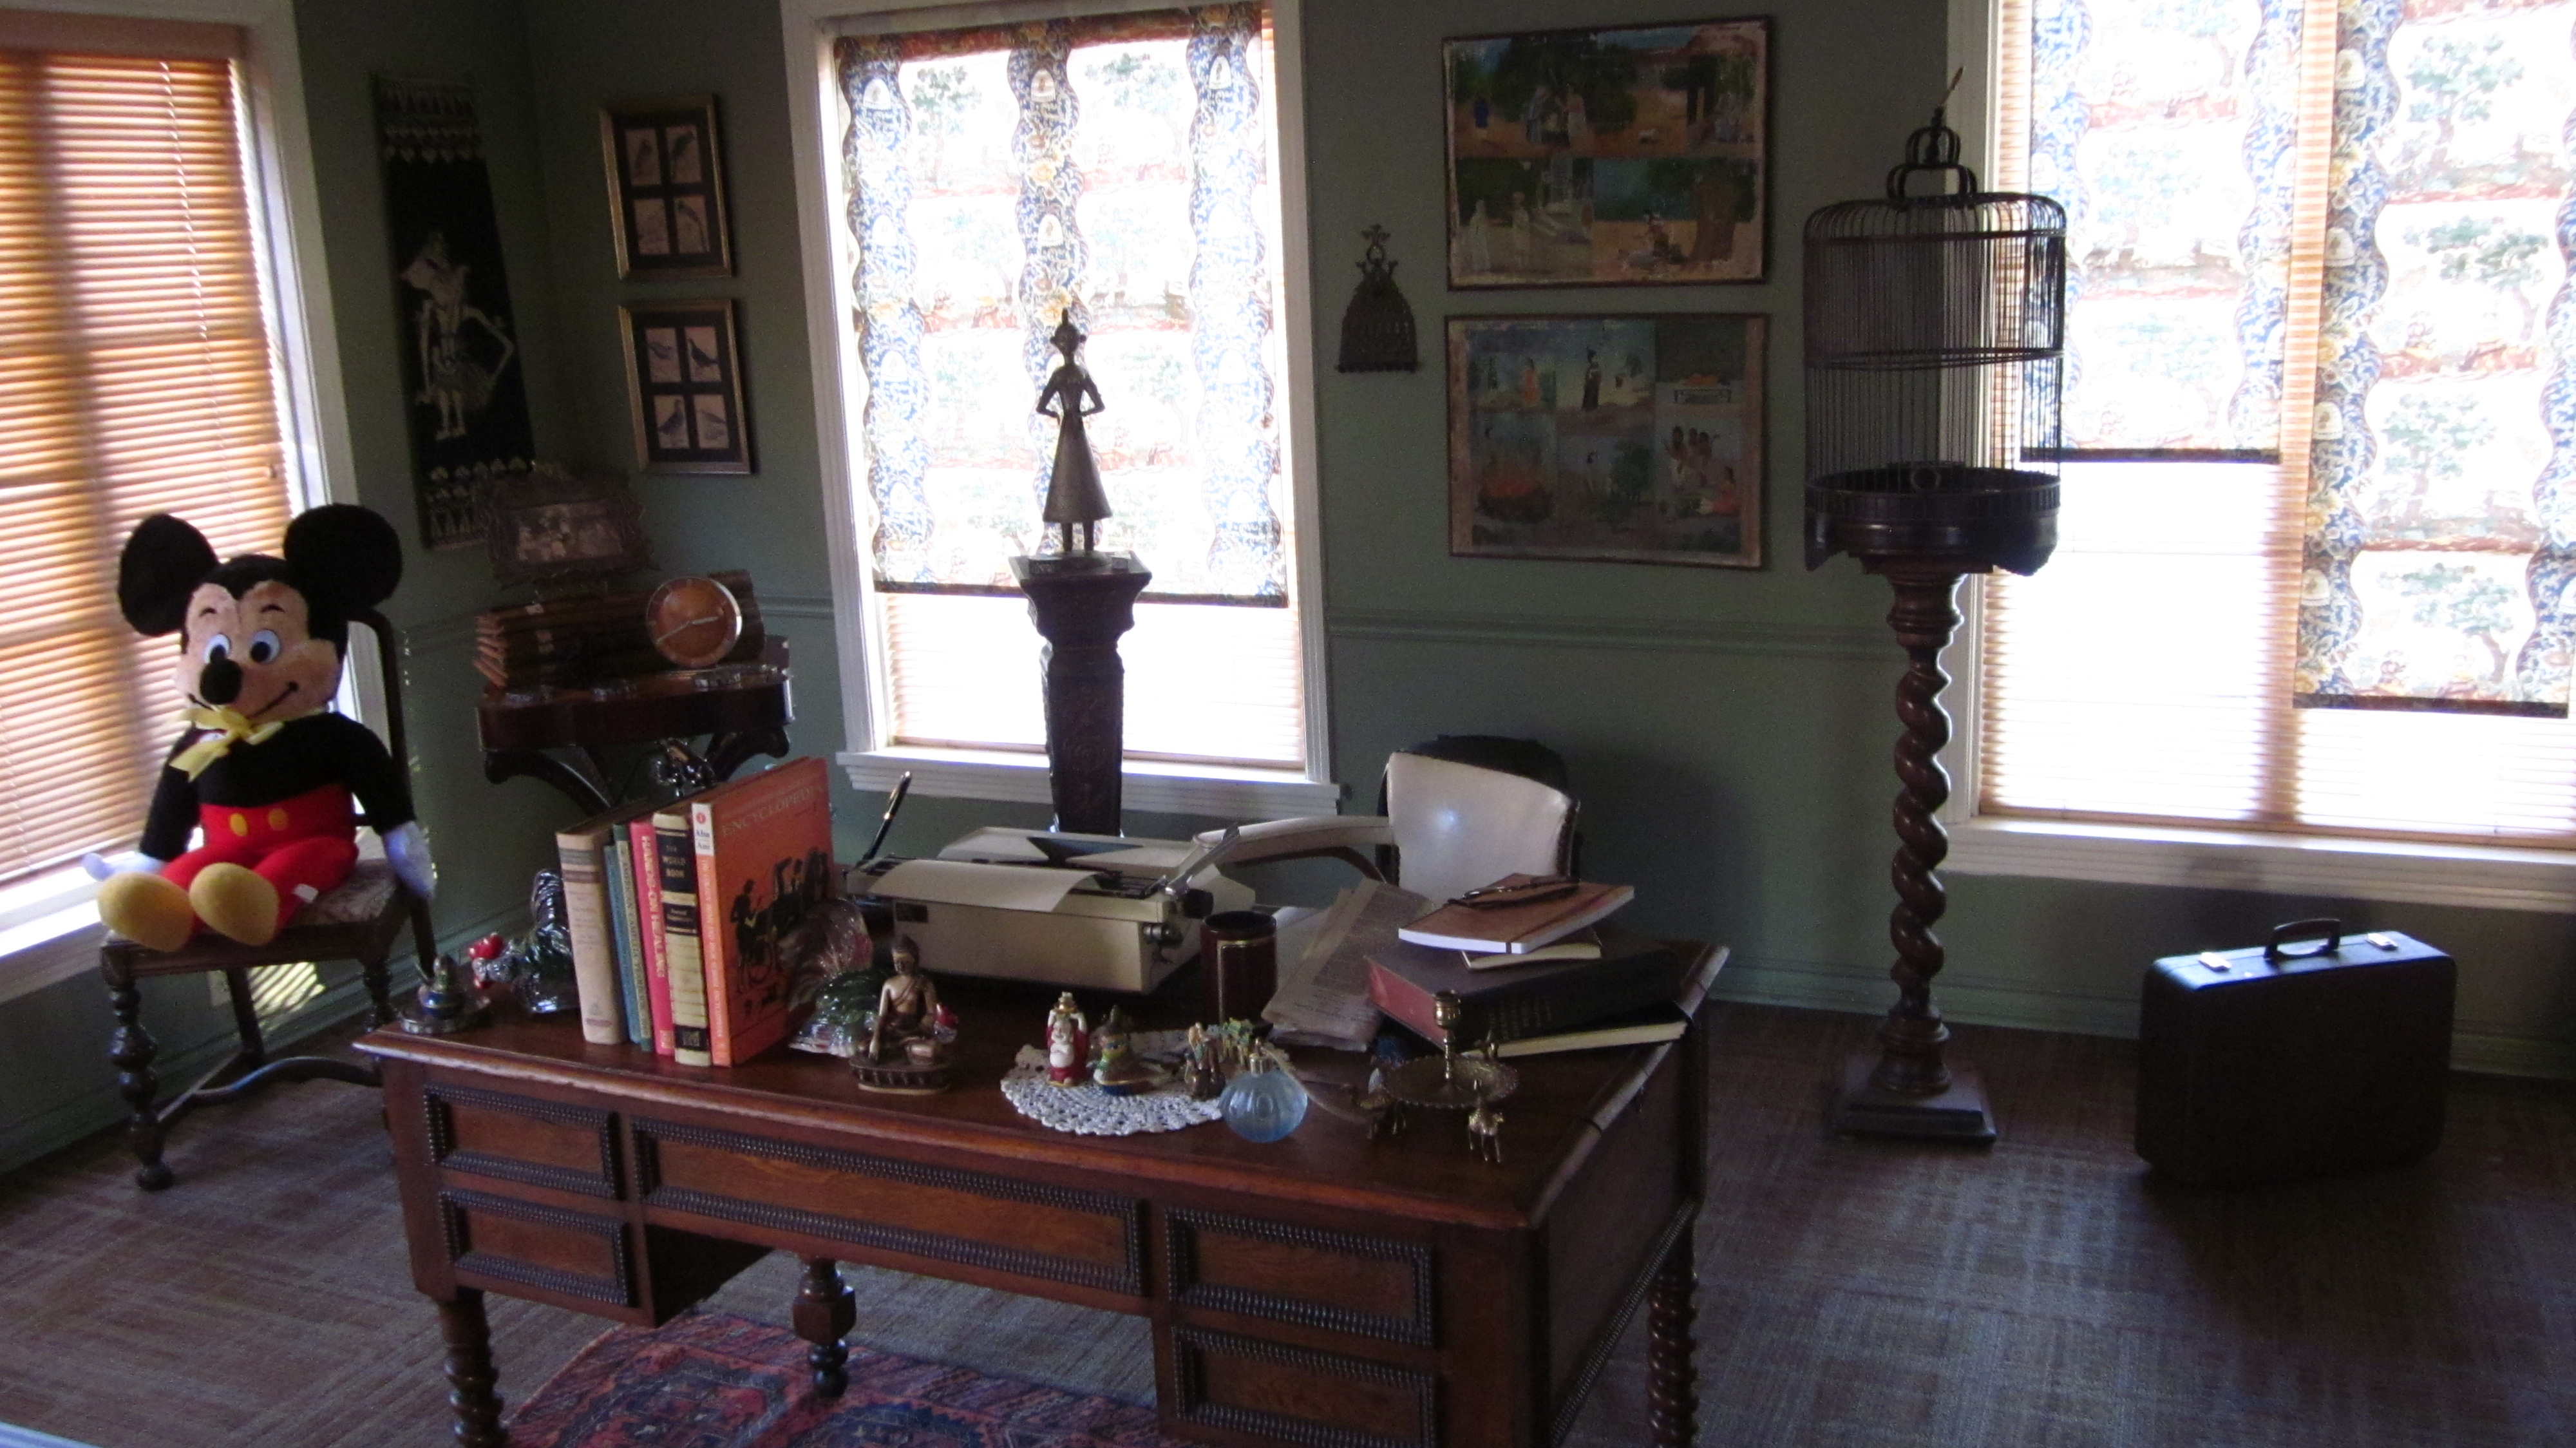 P Design: The Filming Locations Of Disney's Saving Mr. Banks